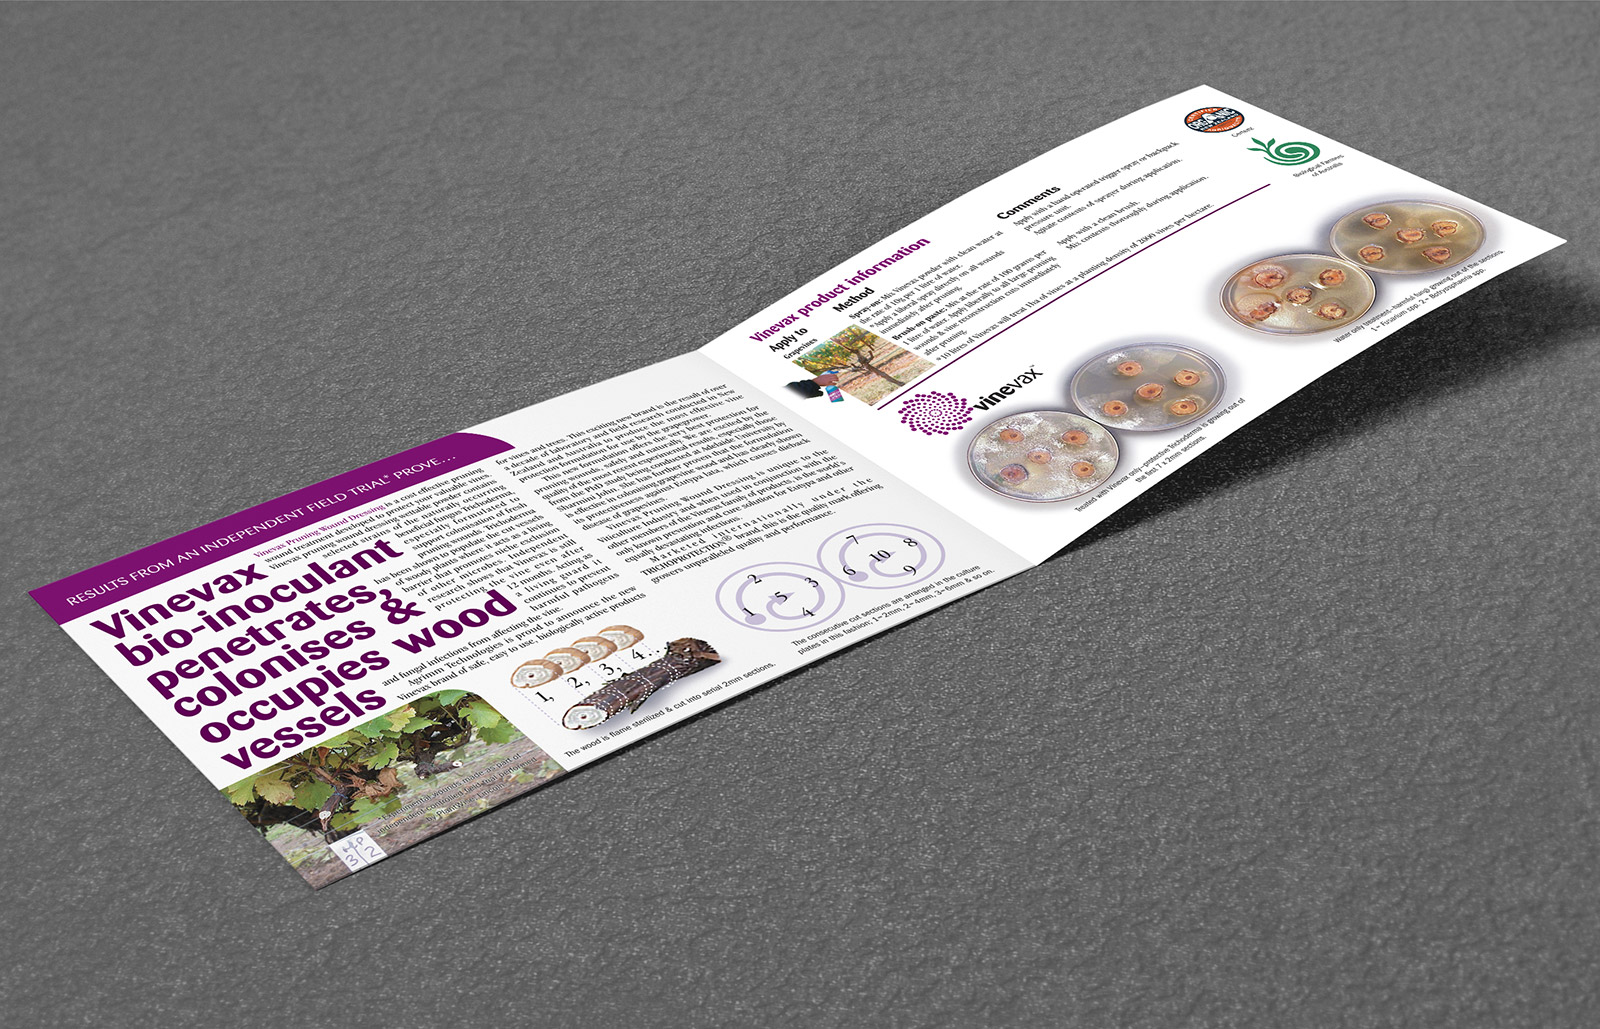 Vinevax PWD brochure redesign inside spread